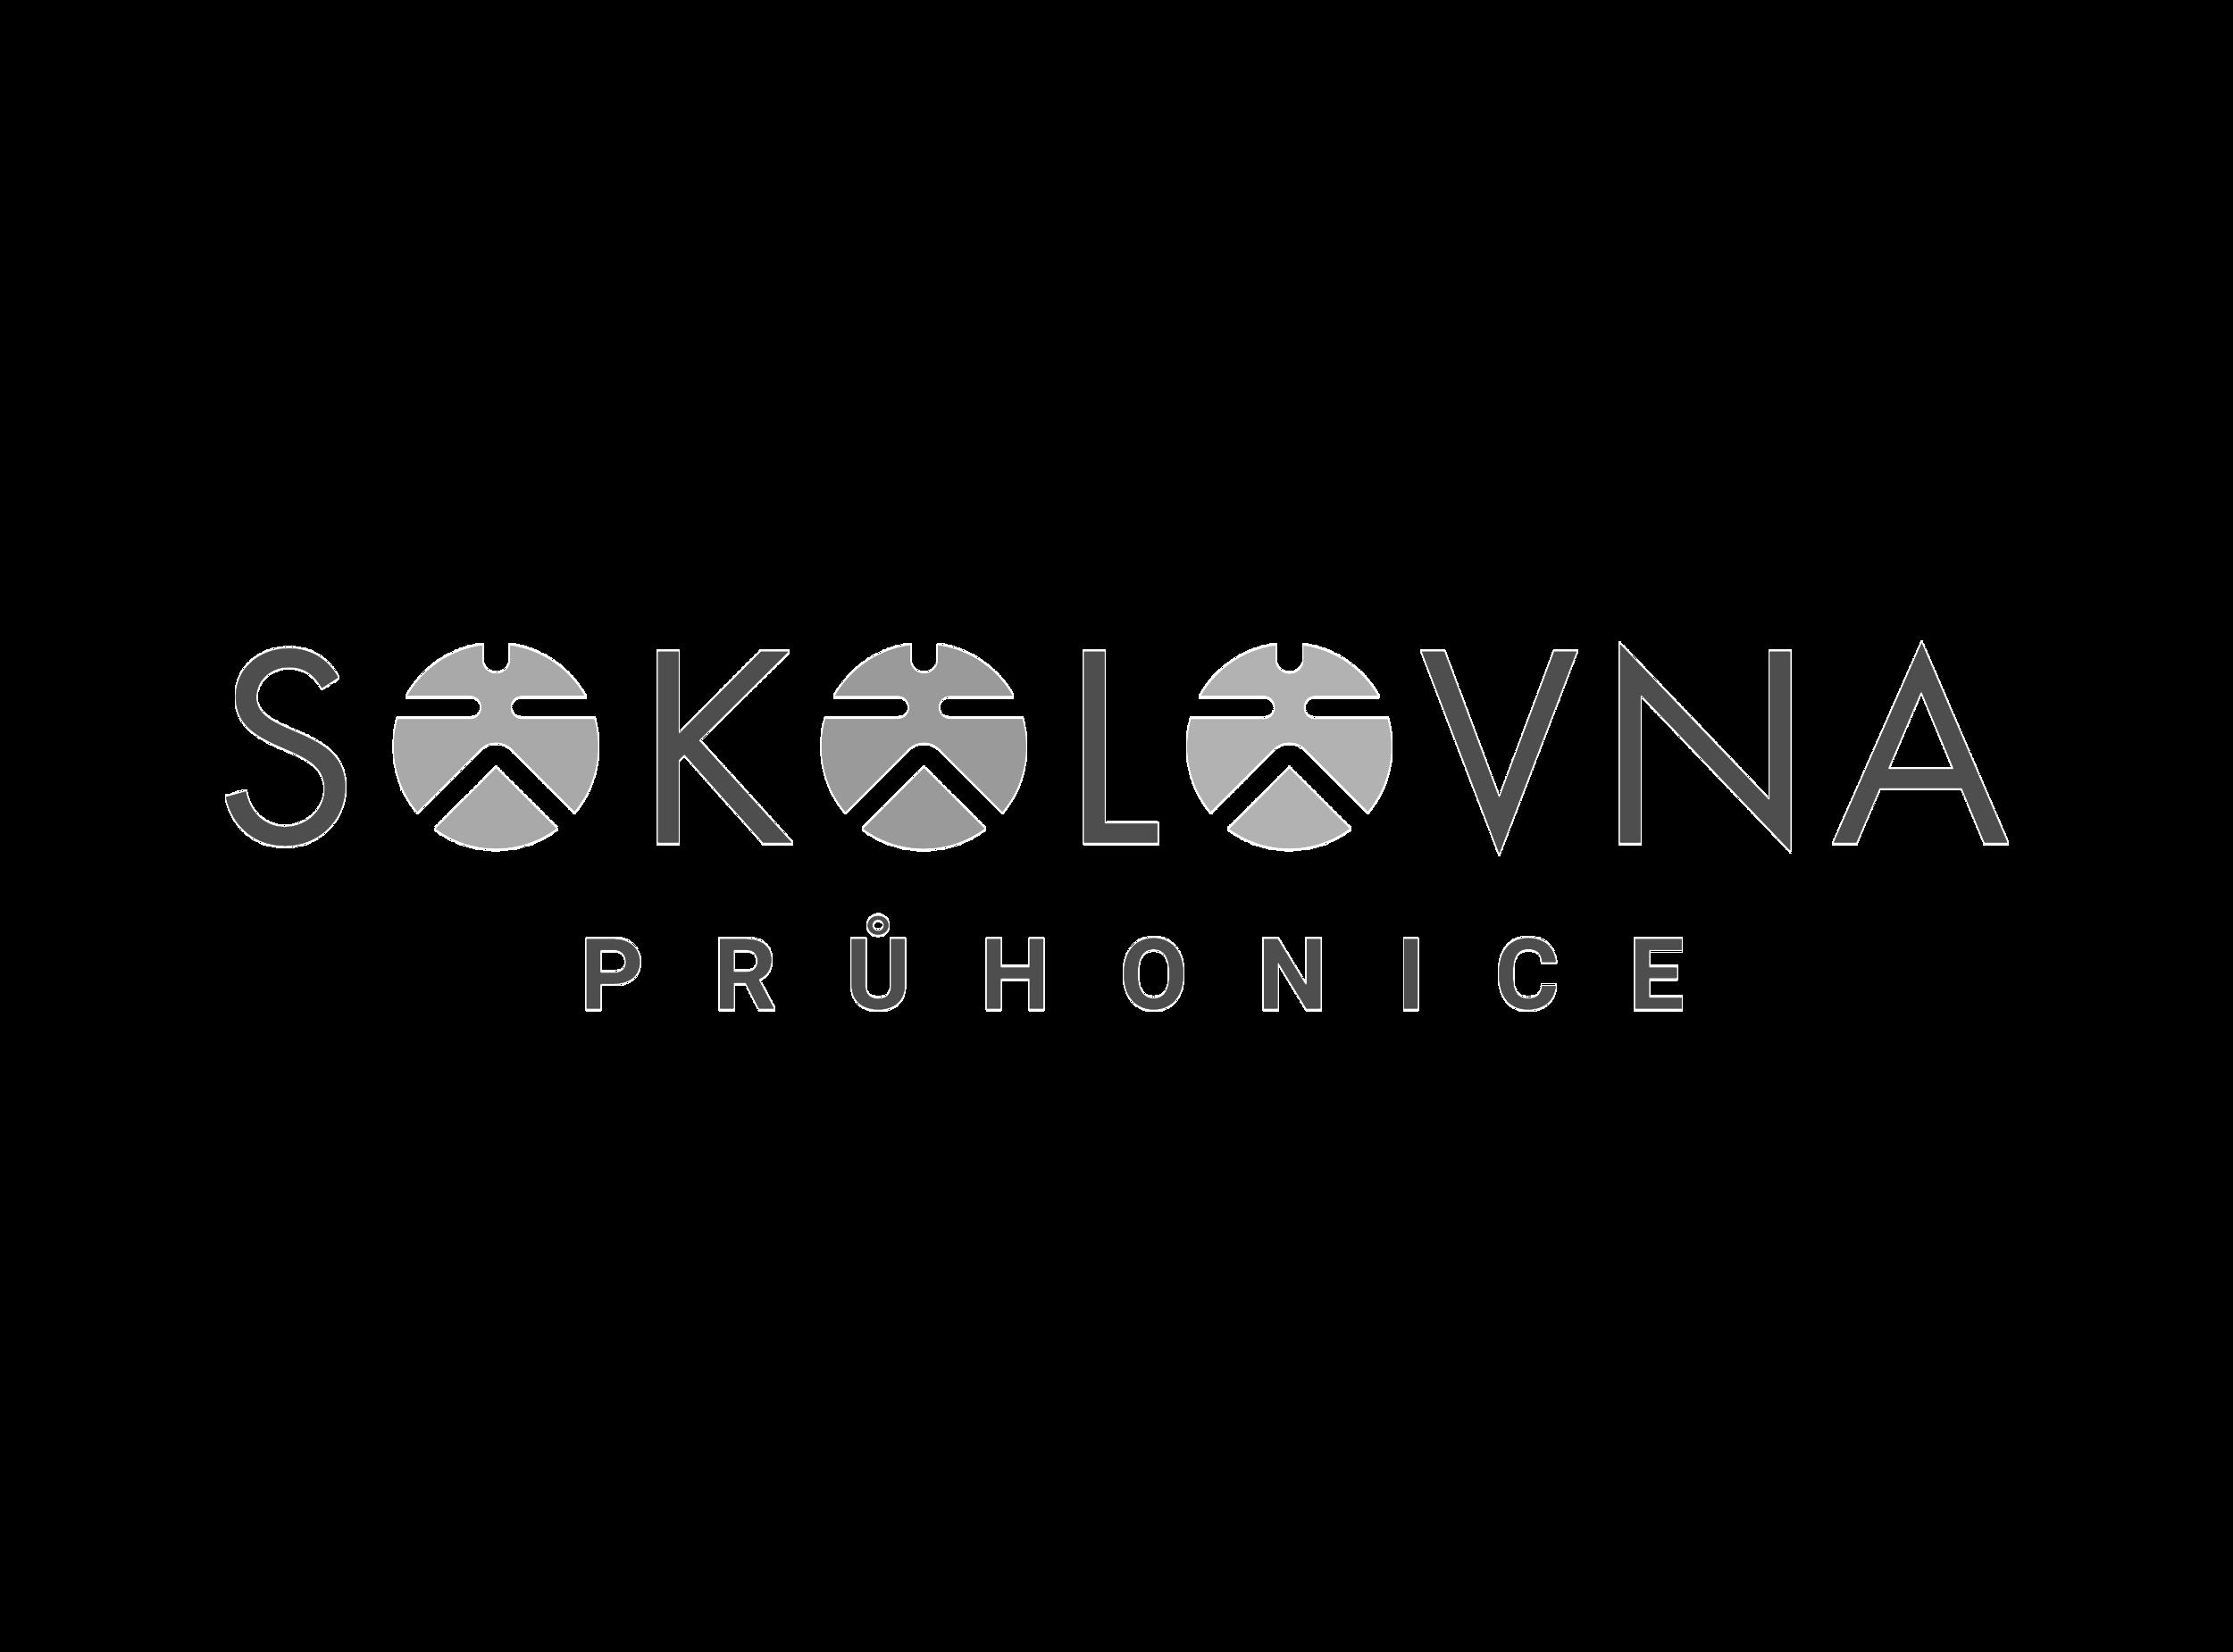 Sokolovna.png